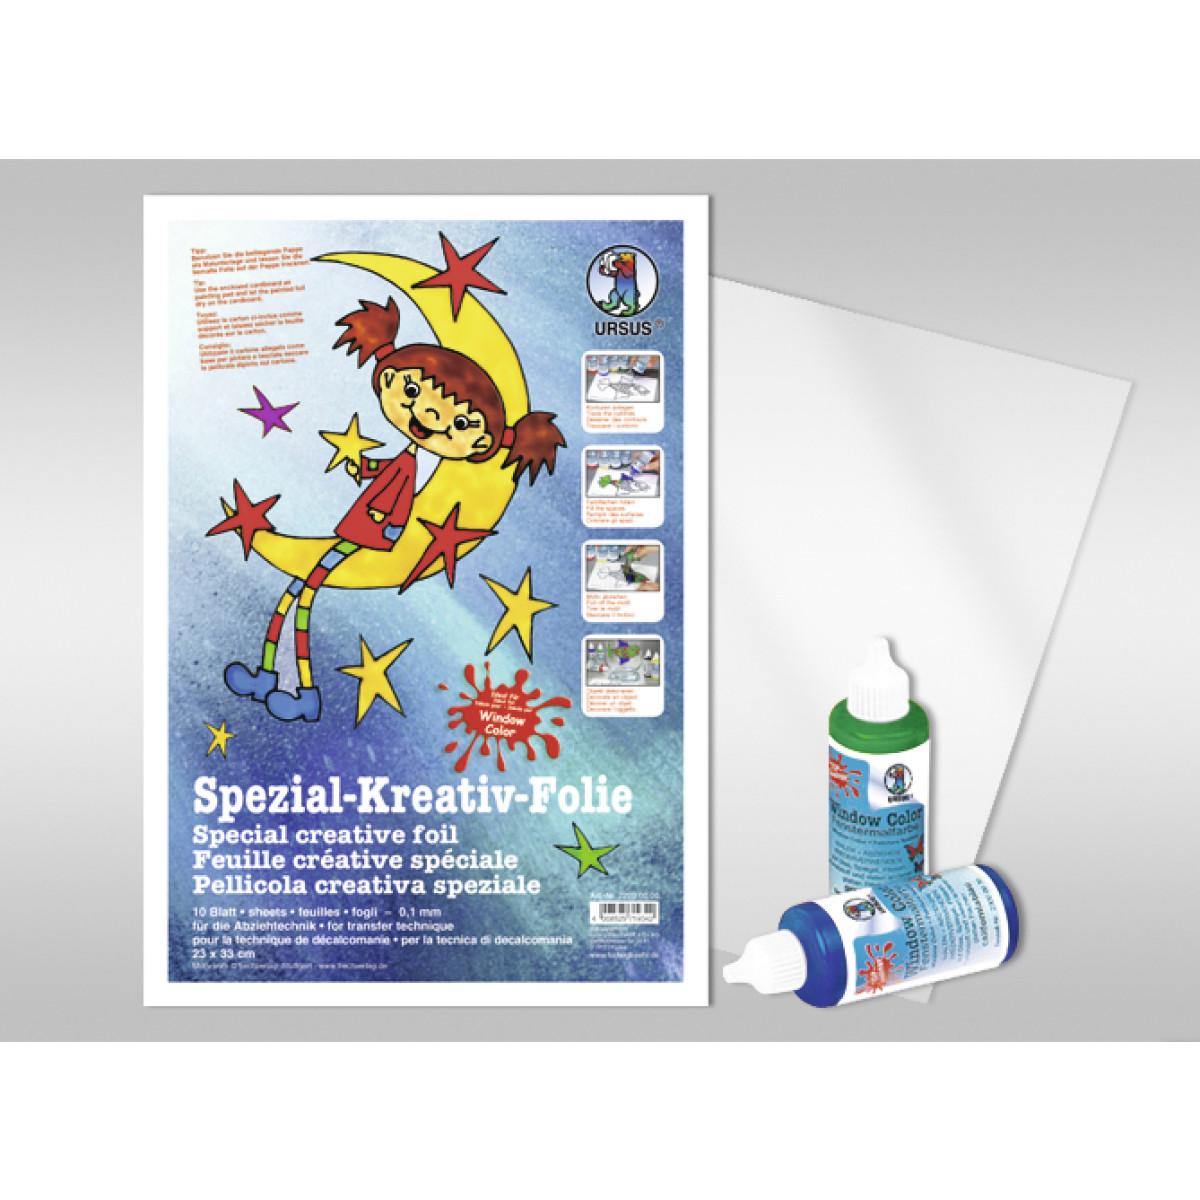 Spezial-Kreativ-Folie 50 x 70 cm - 5 Bogen